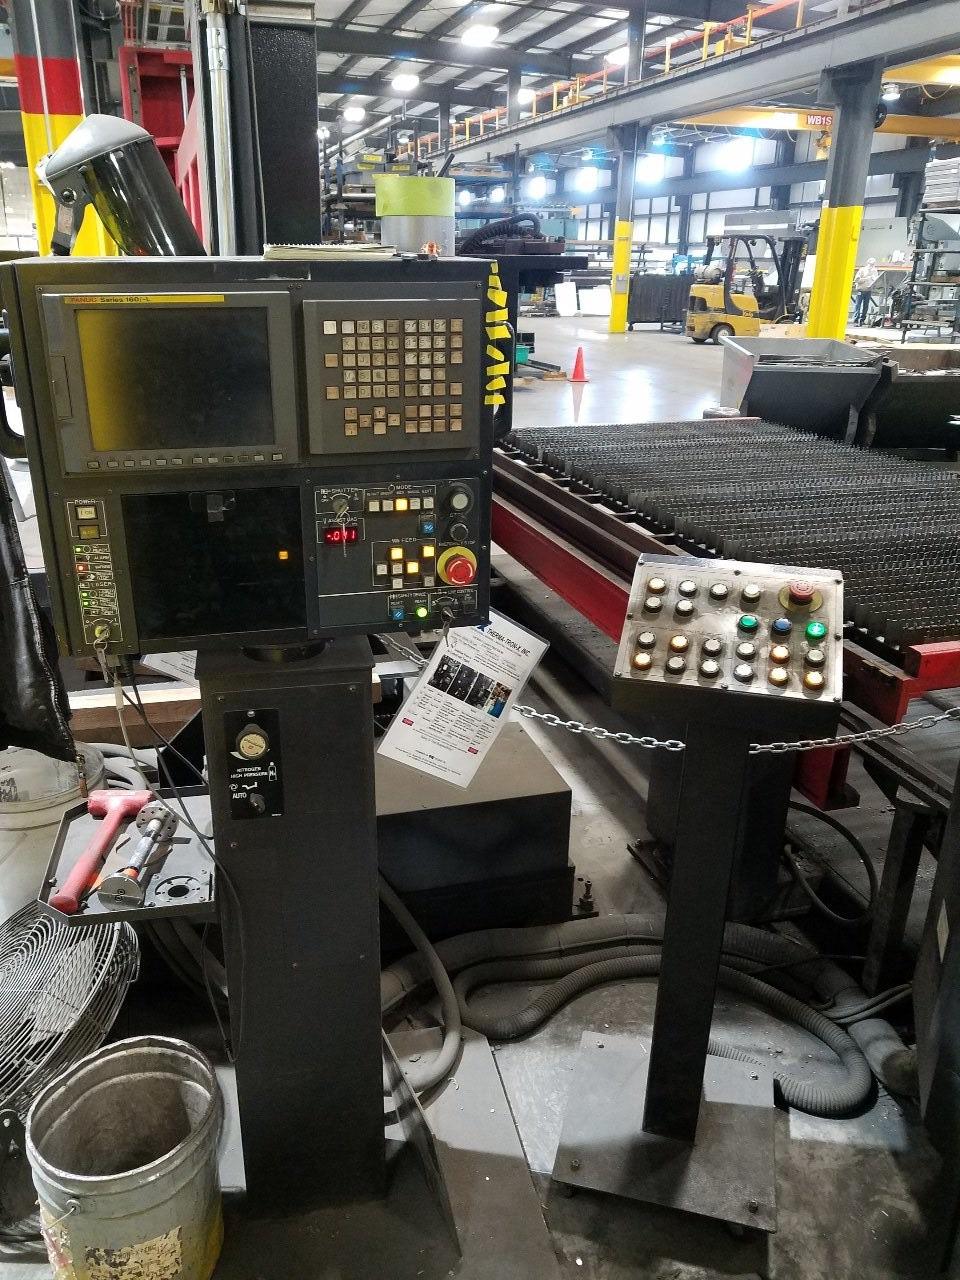 4000 Watt Amada FO-3015, 5' x 10', Pallet Changer, Fanuc 160iL, Chiller, Dust Collector, #29948